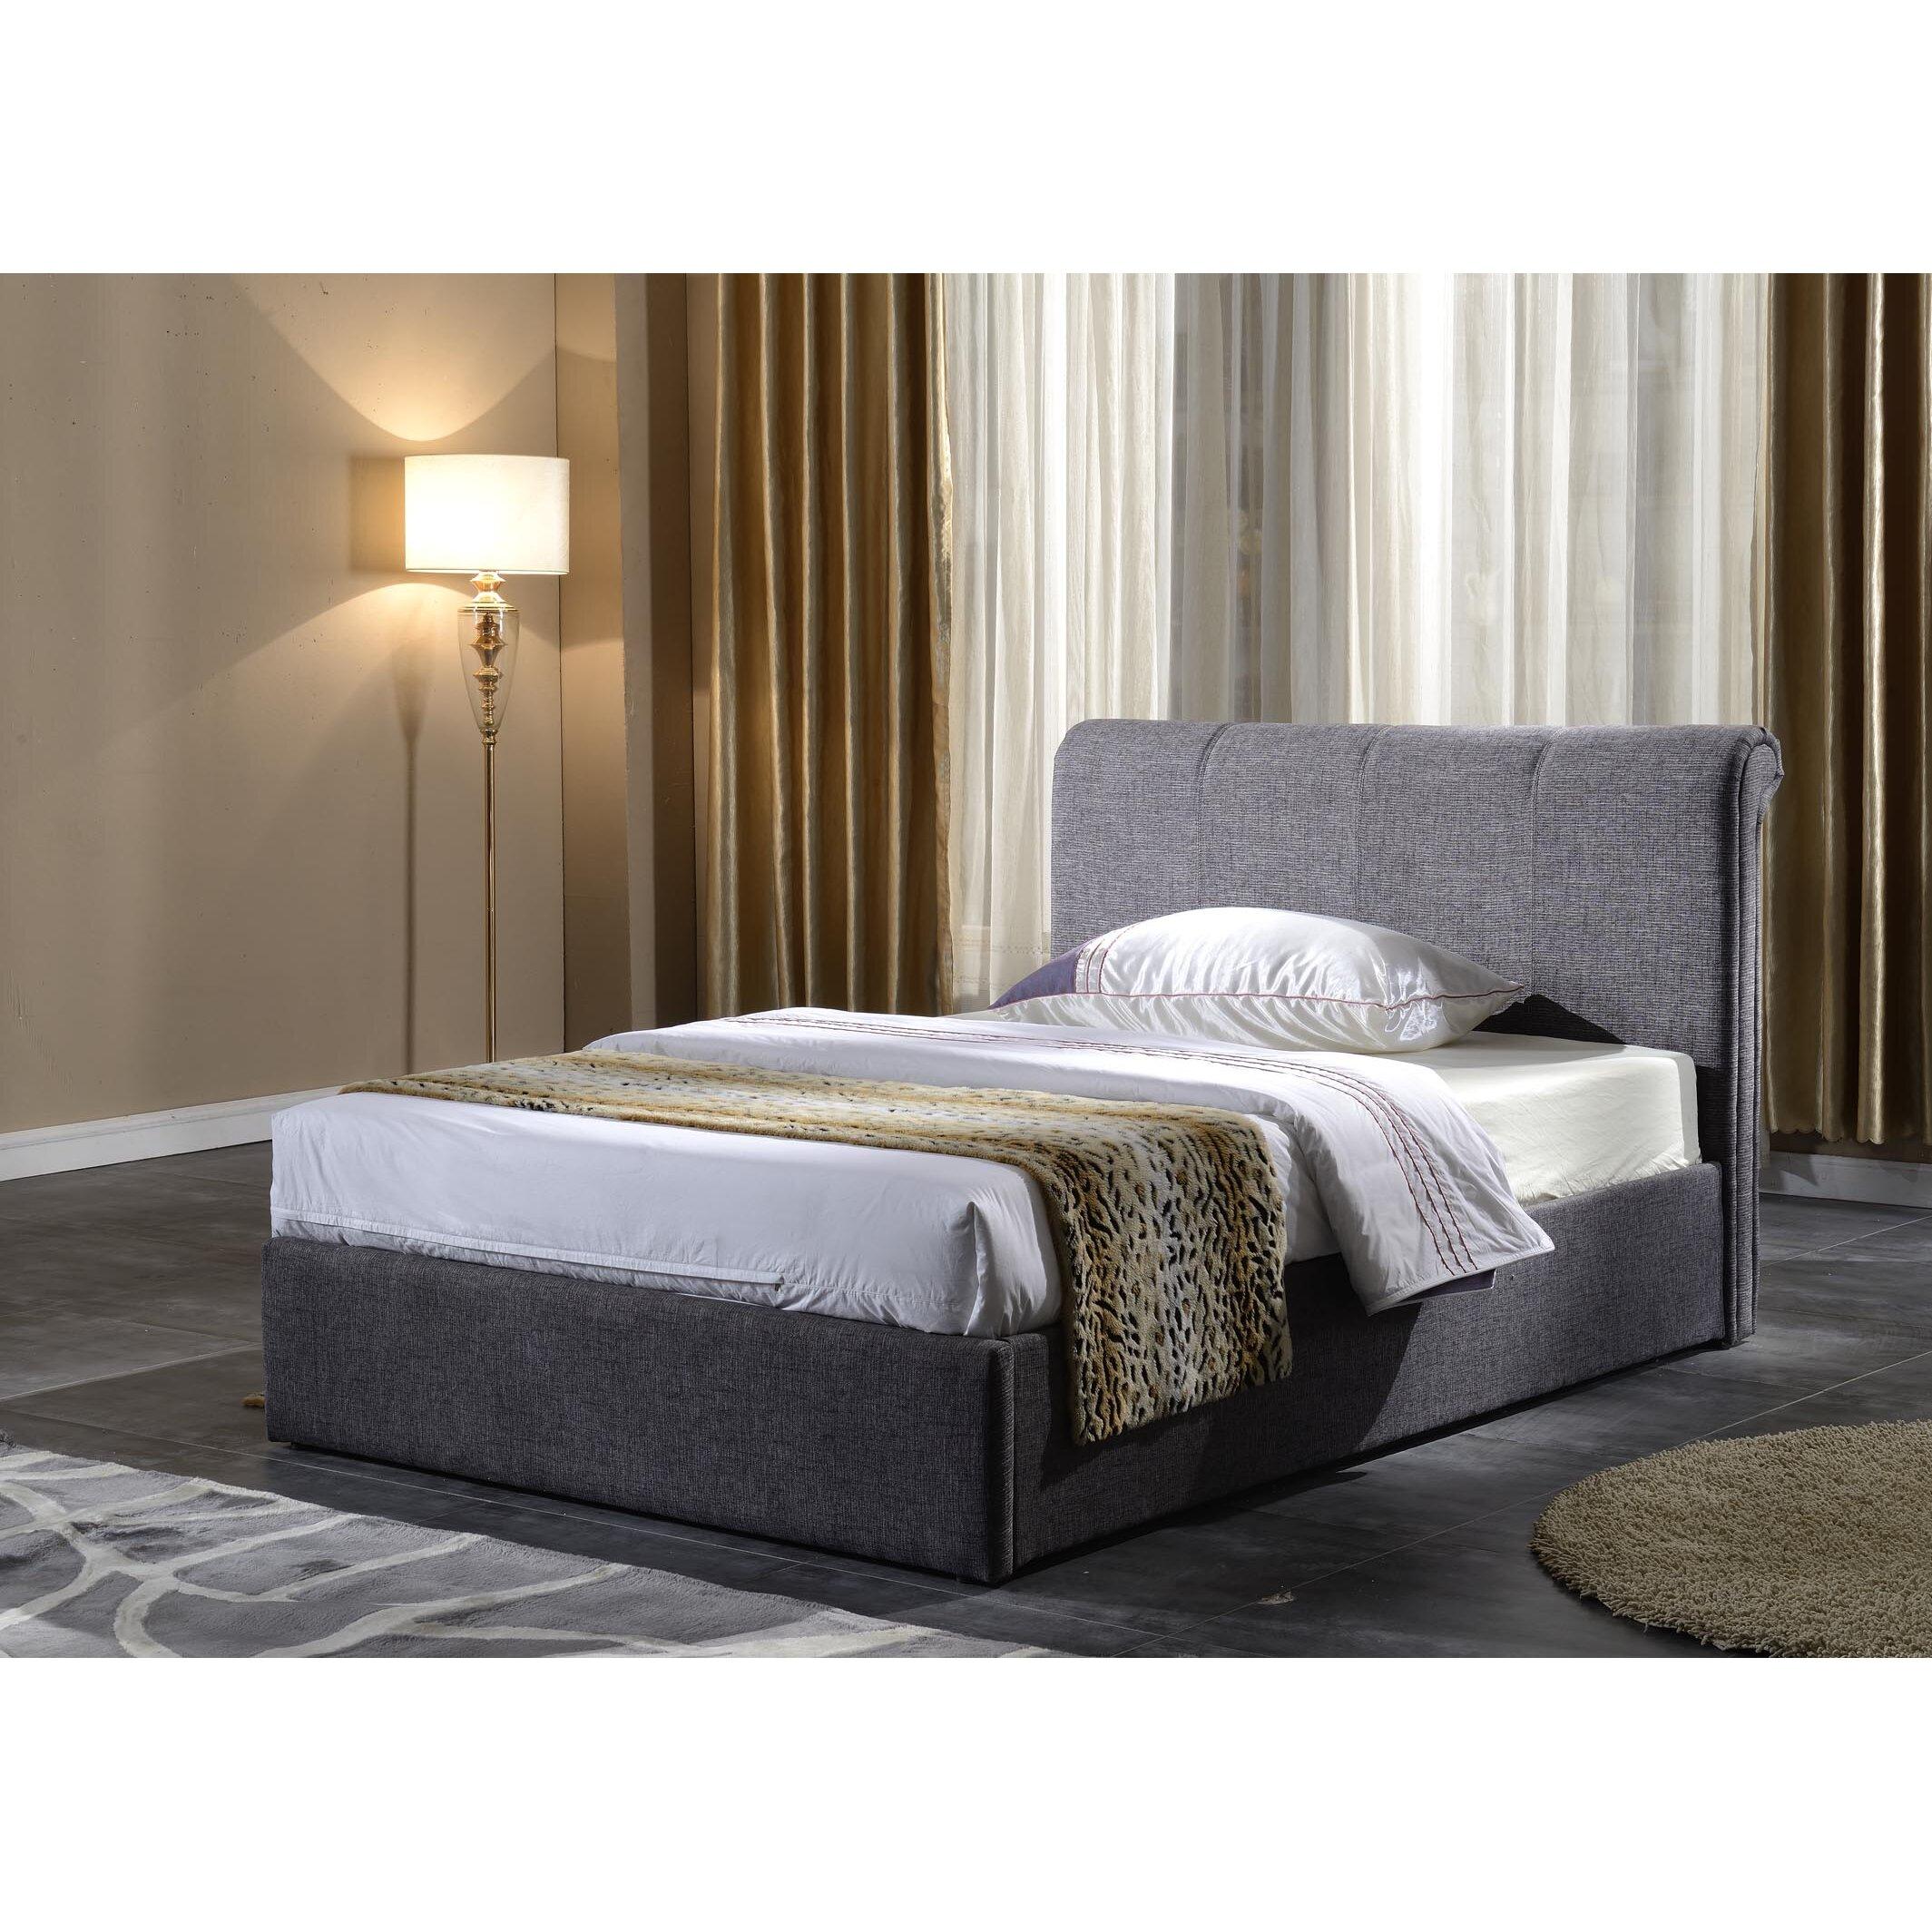 Ottoman Bedroom Home Loft Concept Brynford Ottoman Bed Reviews Wayfaircouk